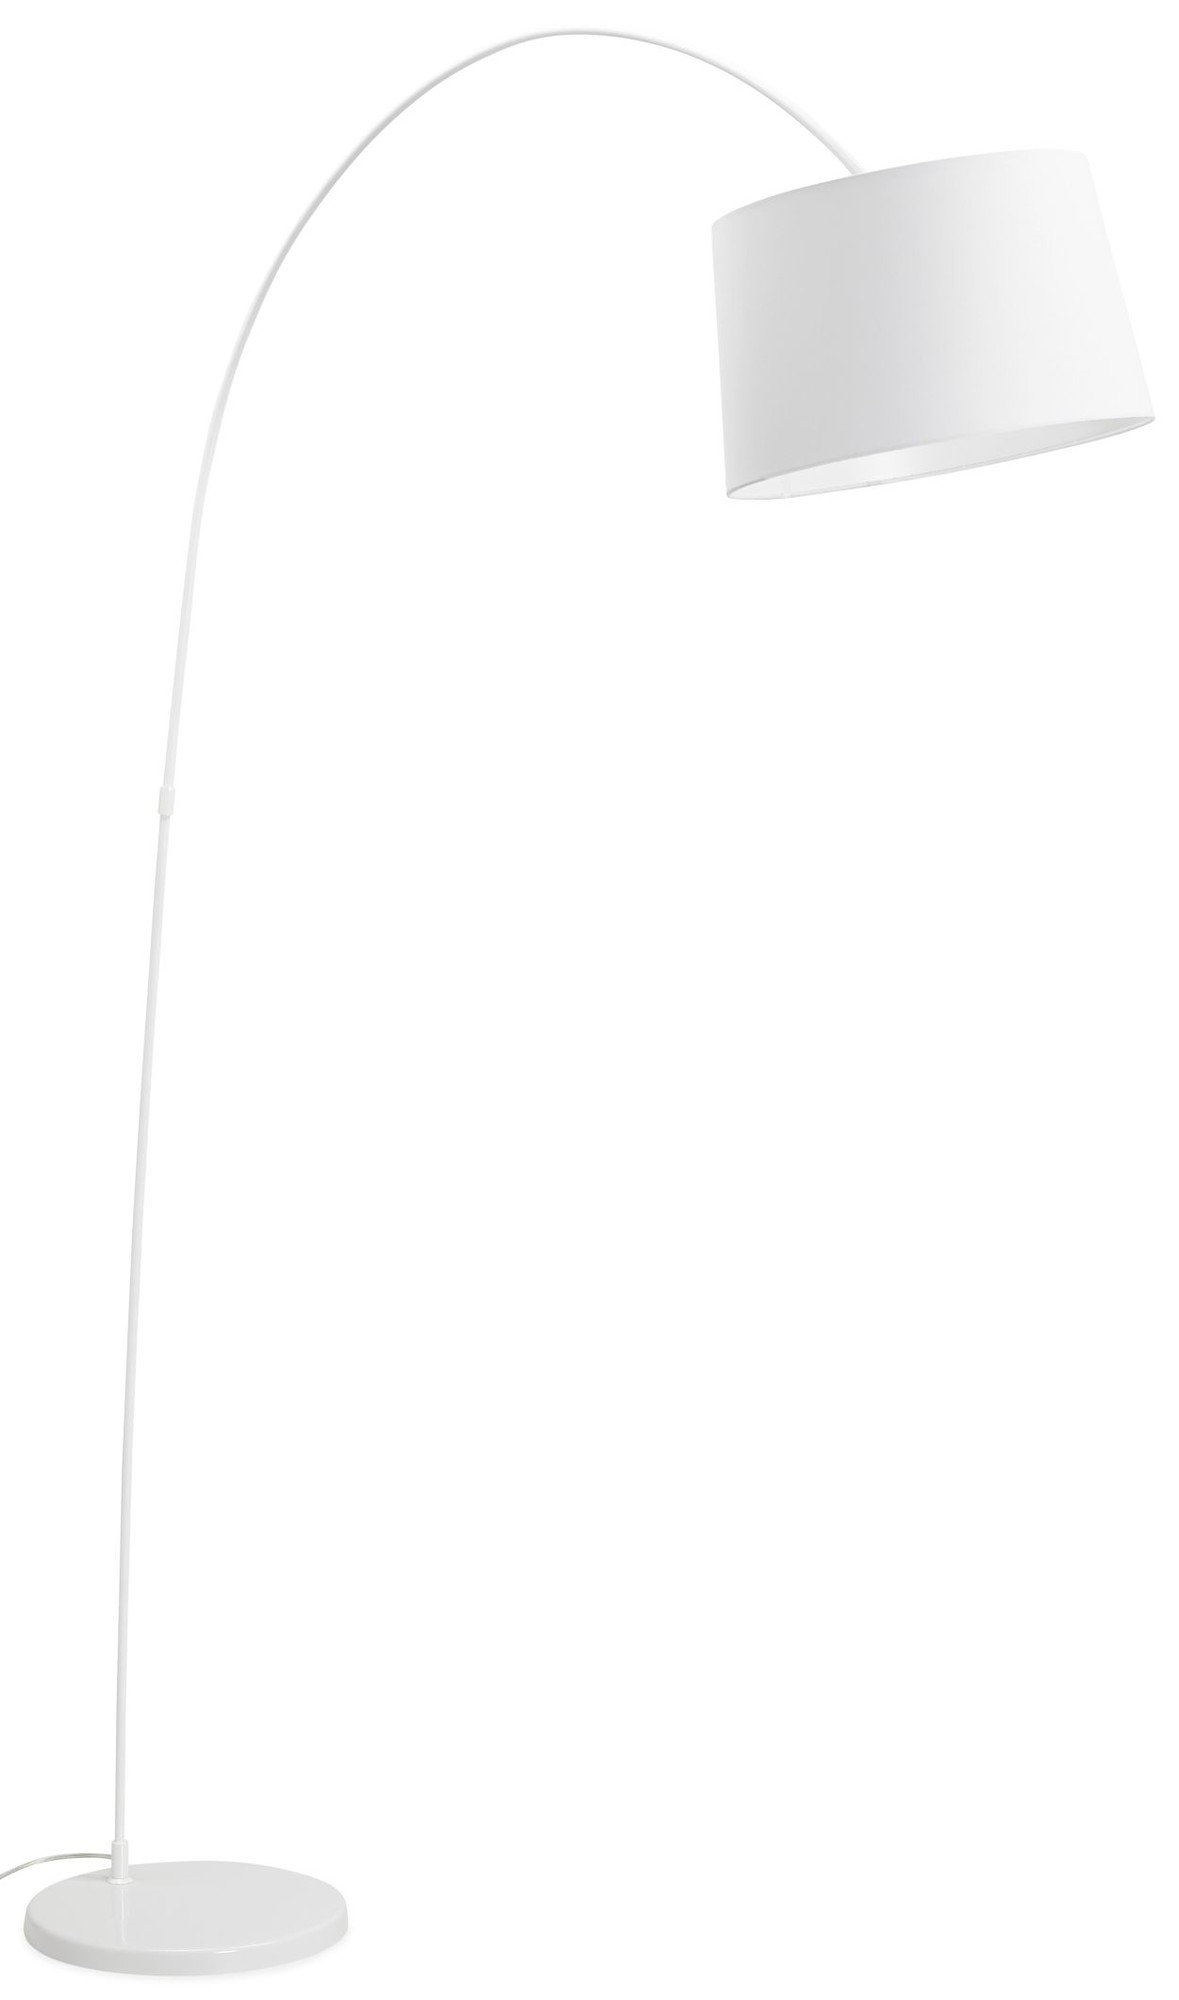 24Designs Booglamp Harmon - Hoogte 205 Cm - Wit